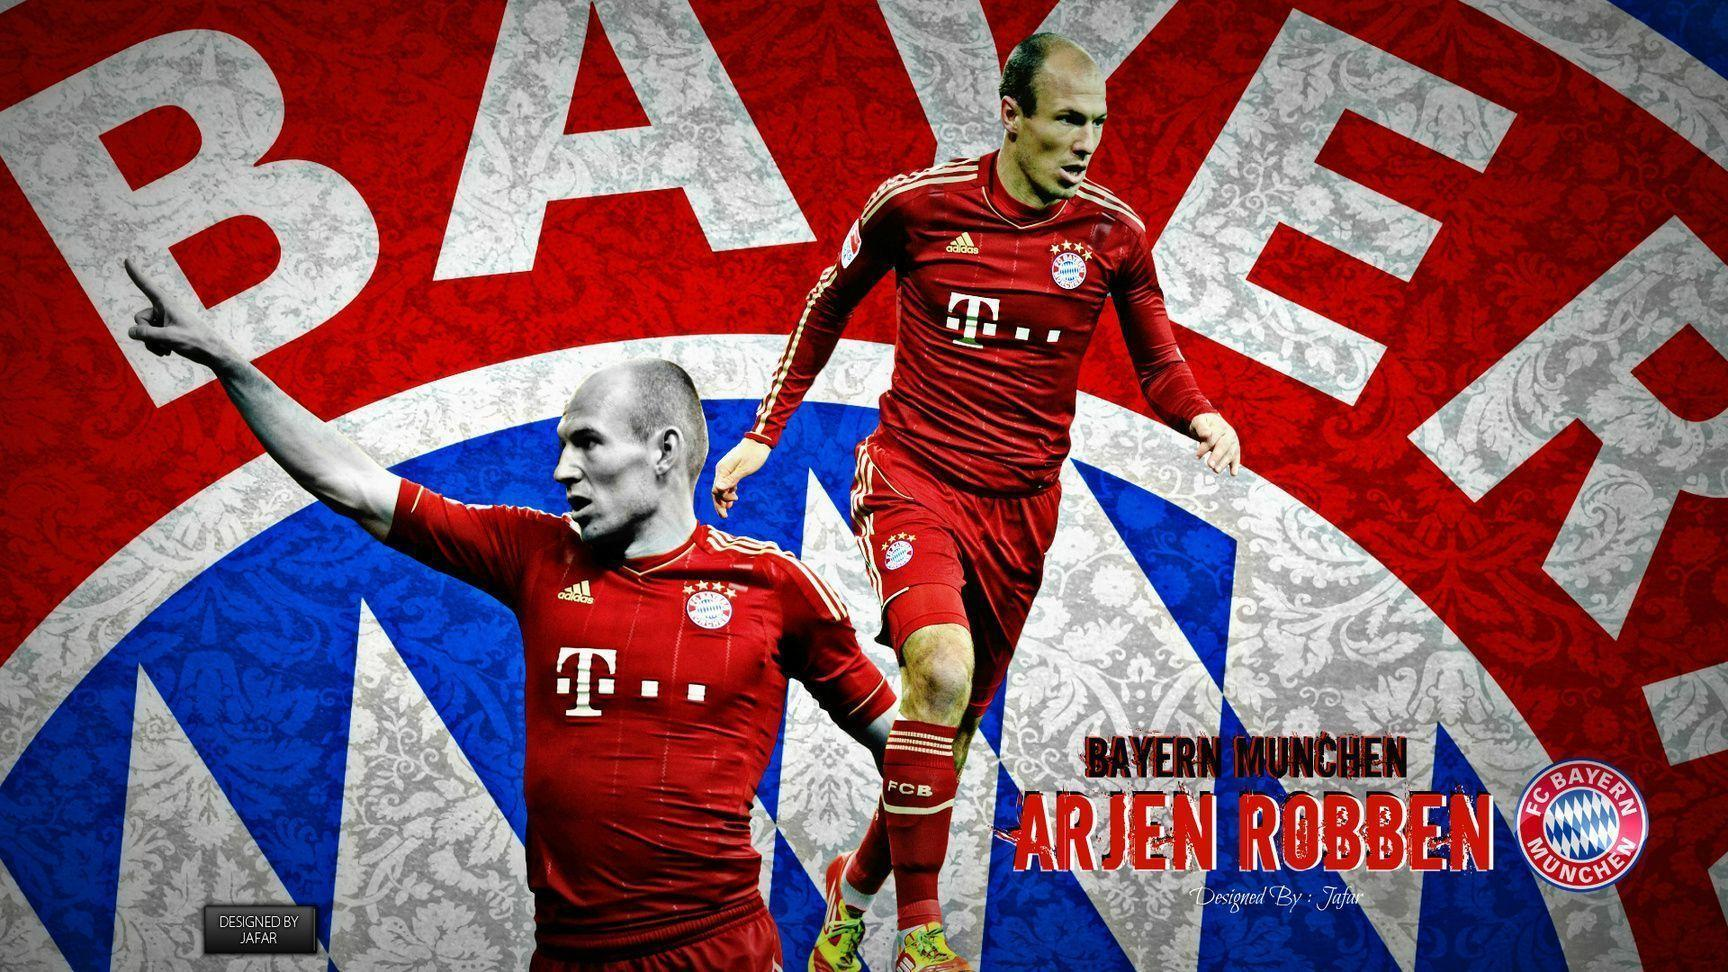 Hd Wallpapers Arjen Robben Bayern Munich 1366 X 768 959 Kb Jpeg ...